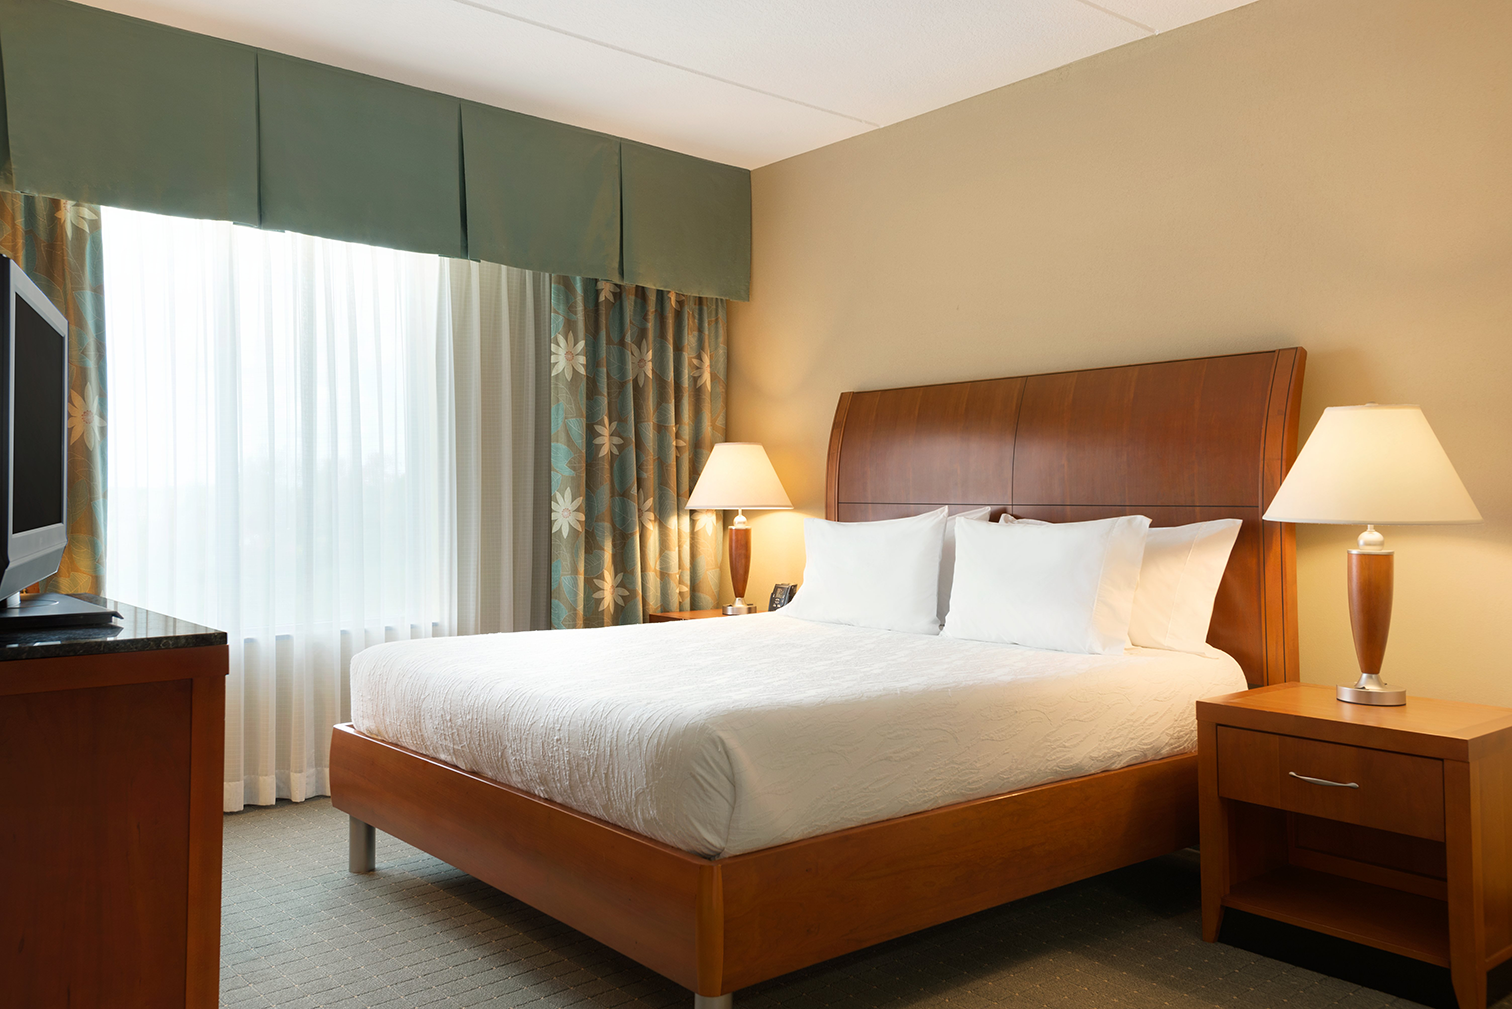 Hilton Garden Inn Palm Coast Town Center – 1 King Bed 1 Bedroom Suite – 1056554